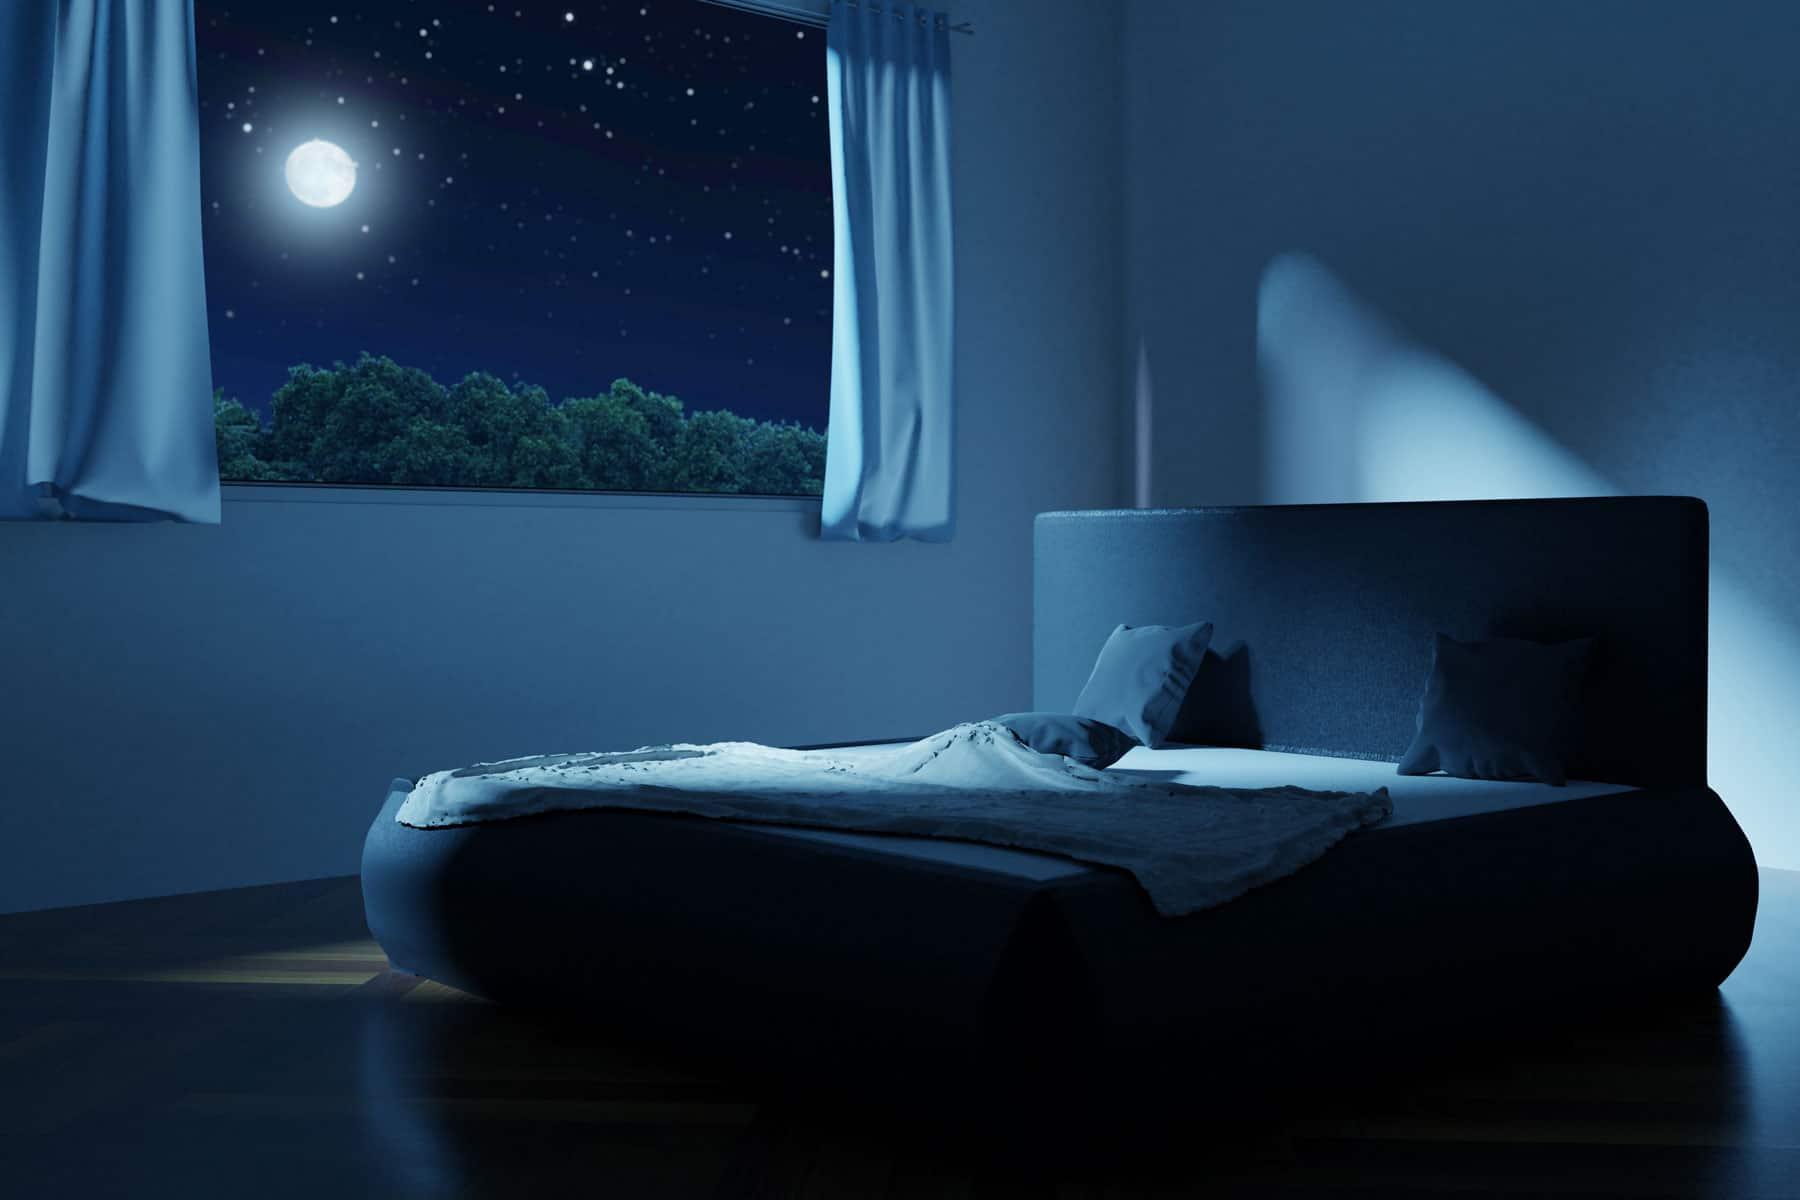 The Midnight Snacker S Bedtime Guide Sleep Junkie